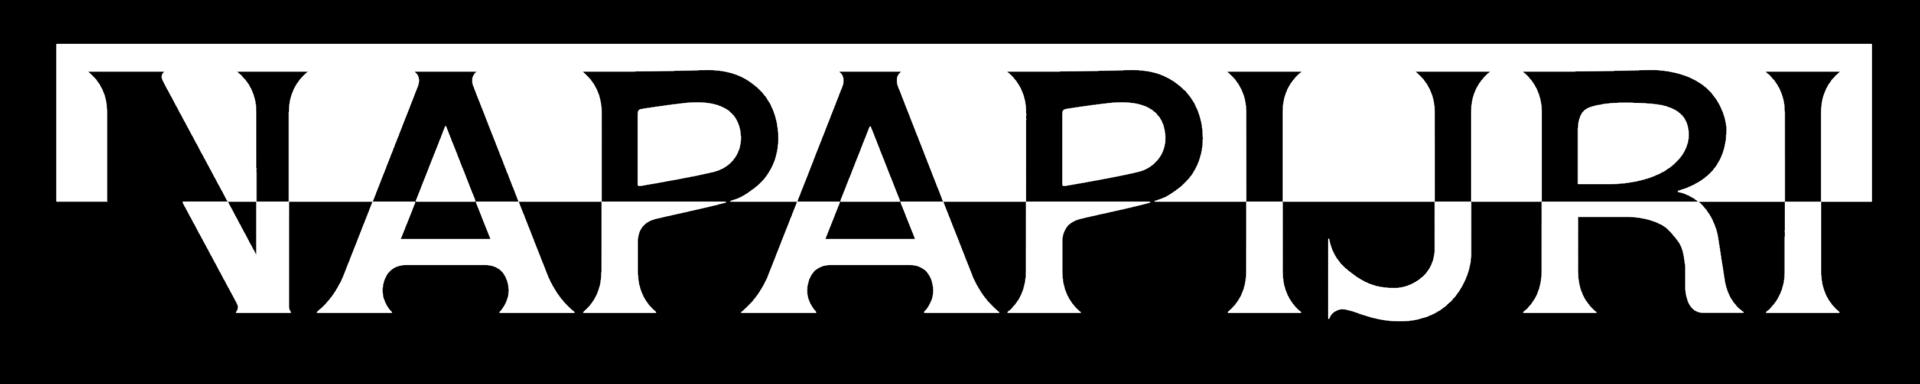 Napapijri_logo - Hébène